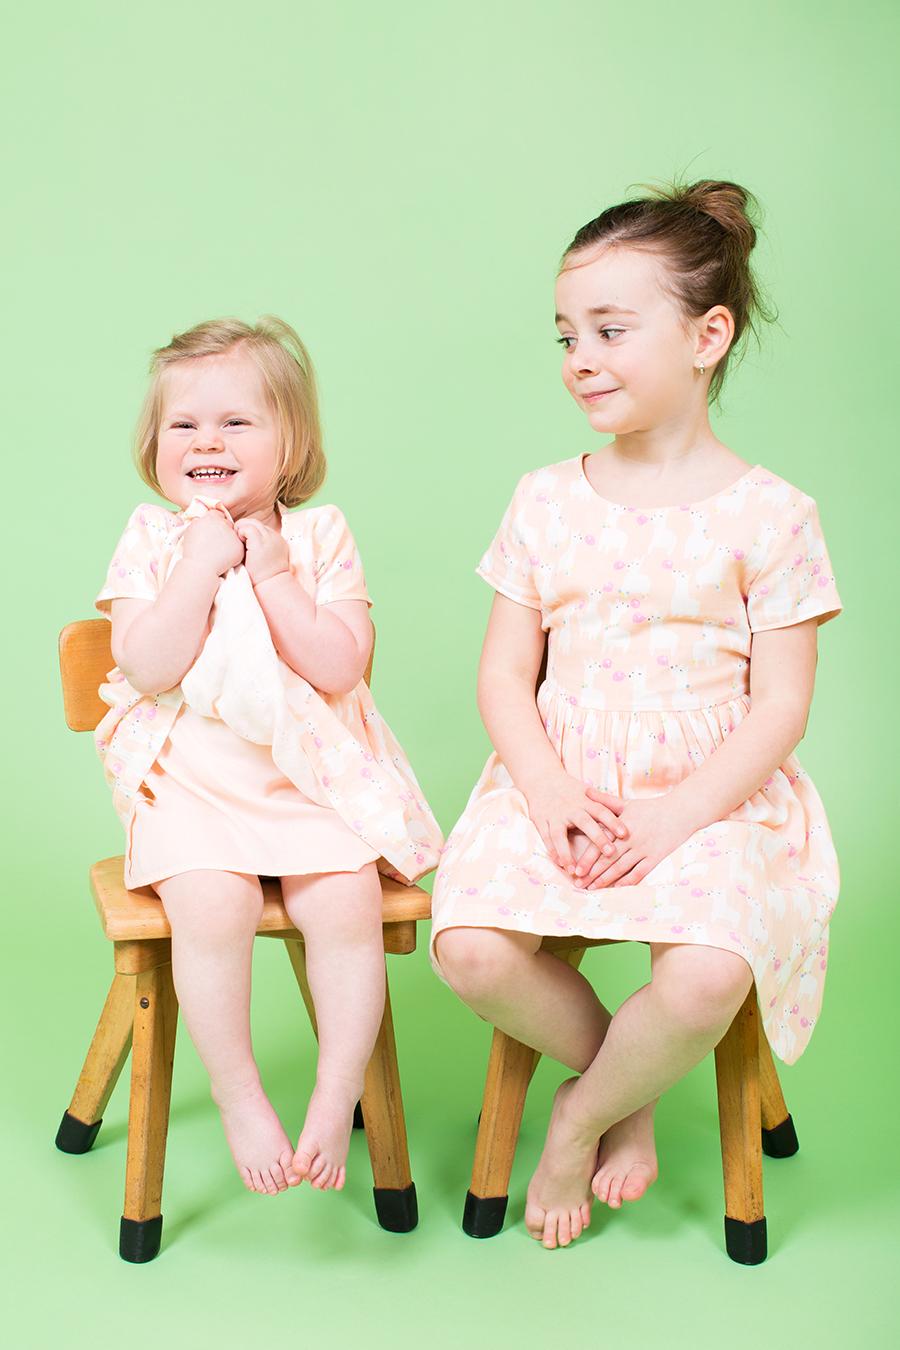 Kinderfotografie studio